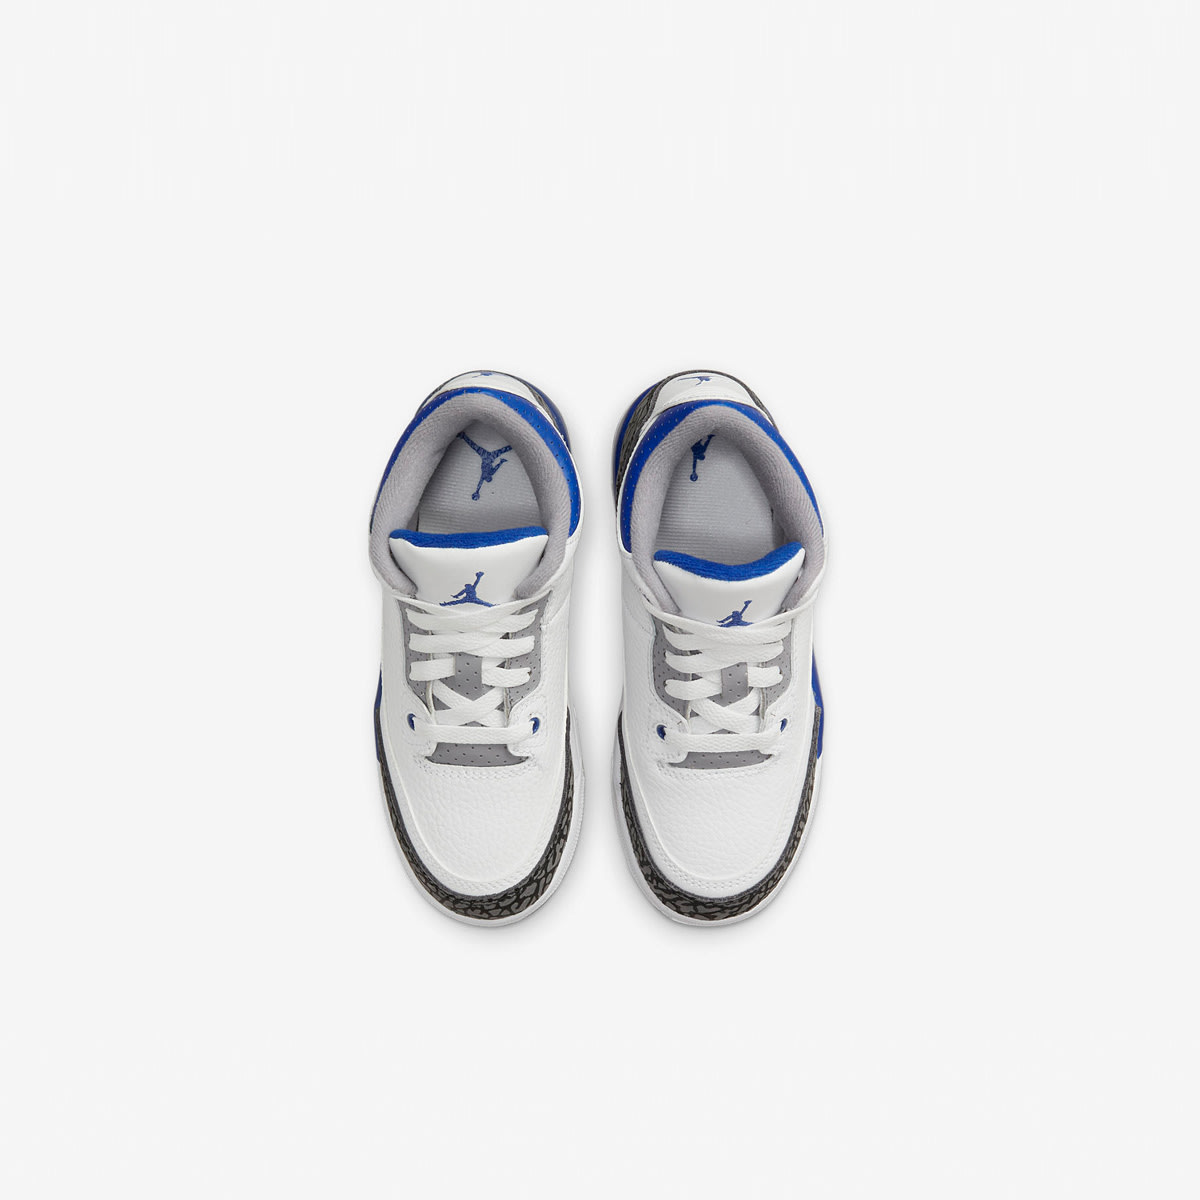 "Air Jordan 3 Retro BP ""Racer Blue"" - 429487-145"